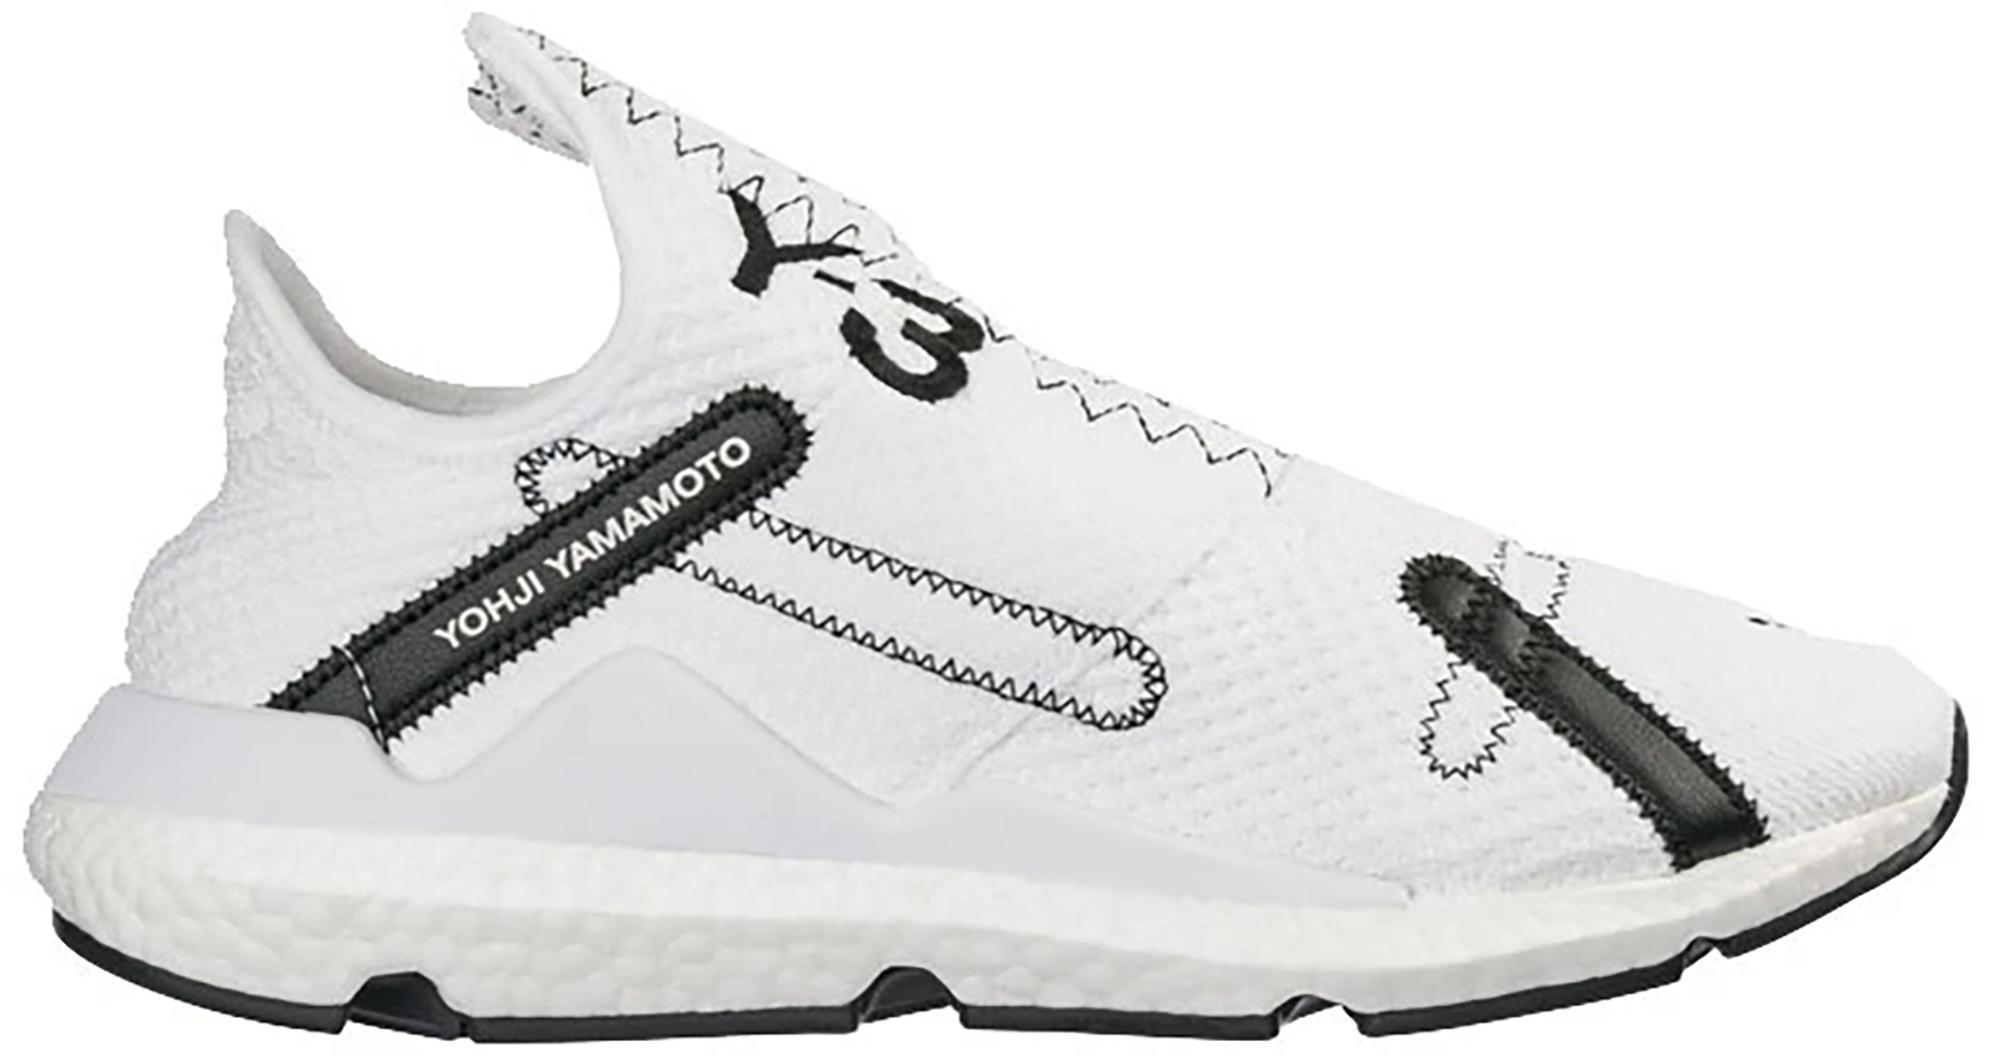 adidas Y-3 Reberu White Black - F97389